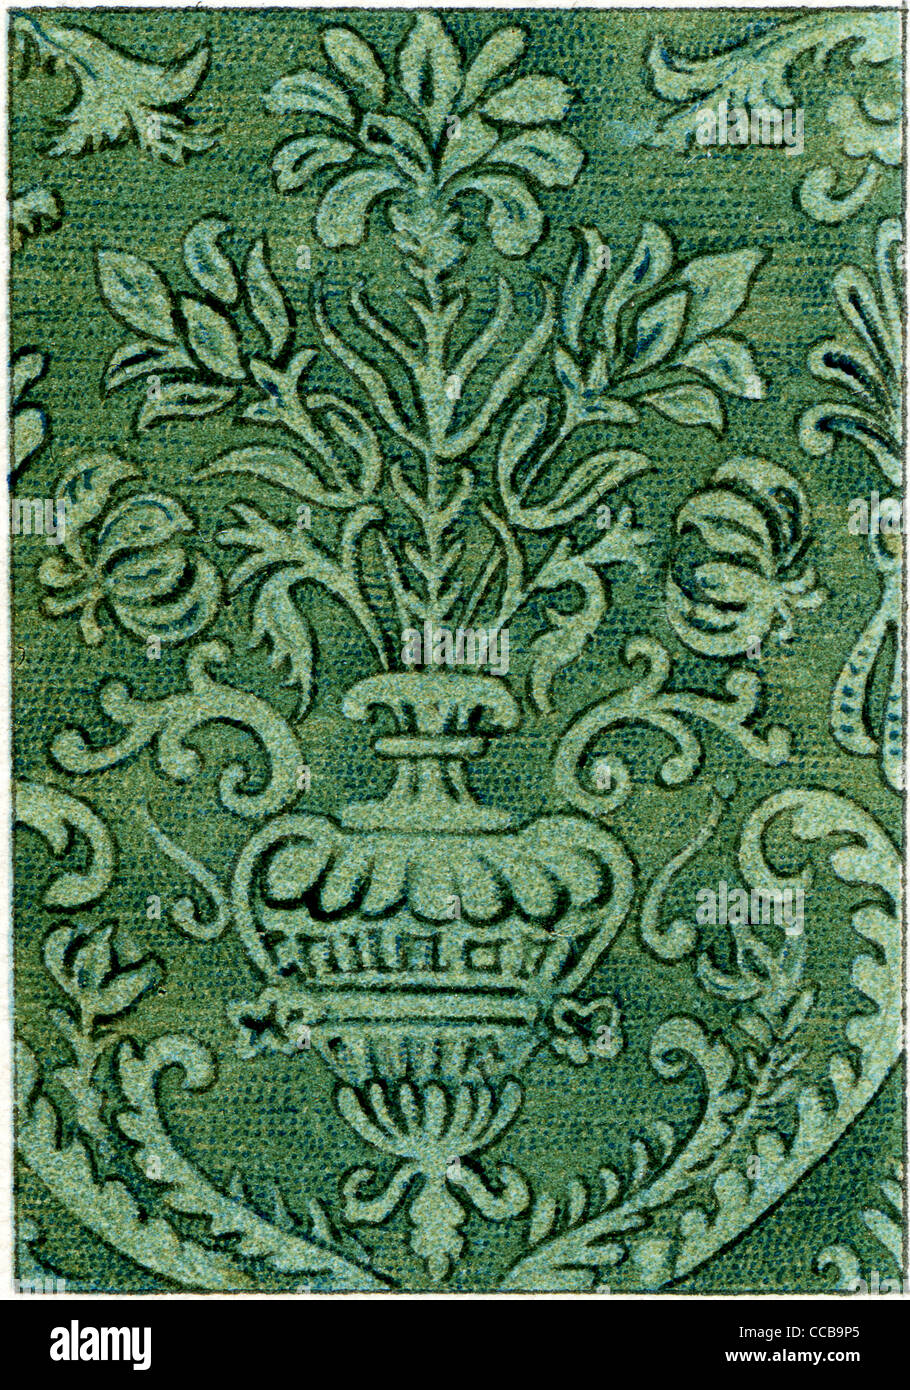 The Pattern On The Velvet Fabric 17th Century Stock Photo Alamy